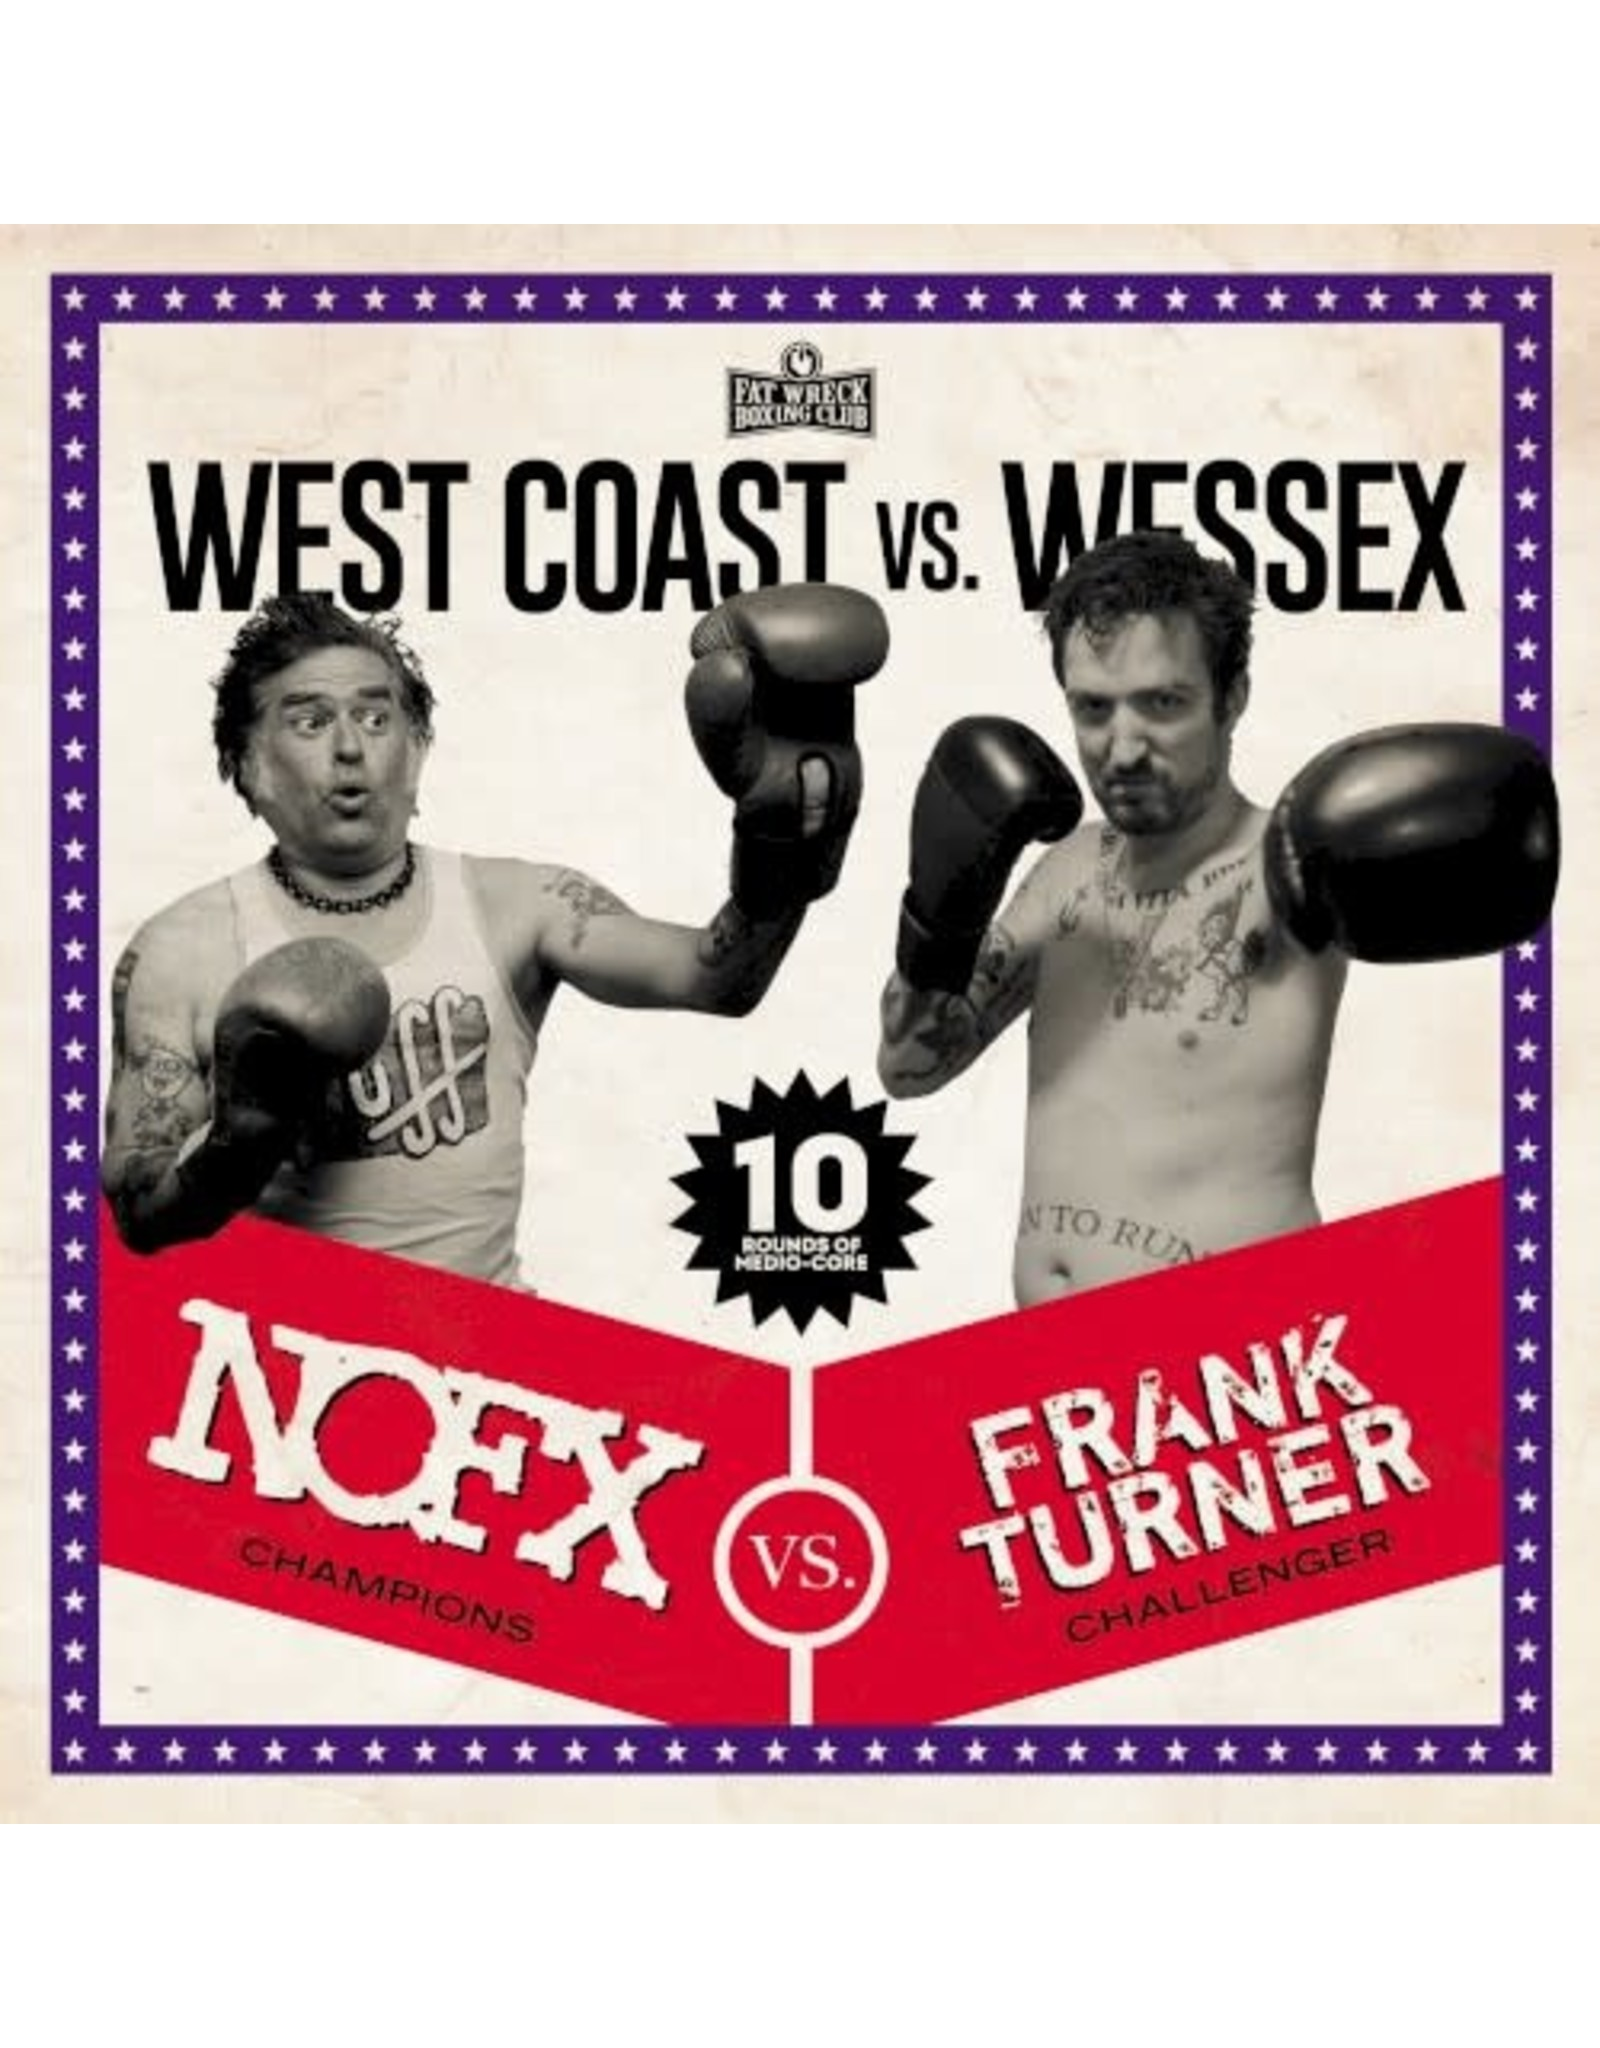 NOFX / Turner, Frank - West Coast Vs Wessex LP